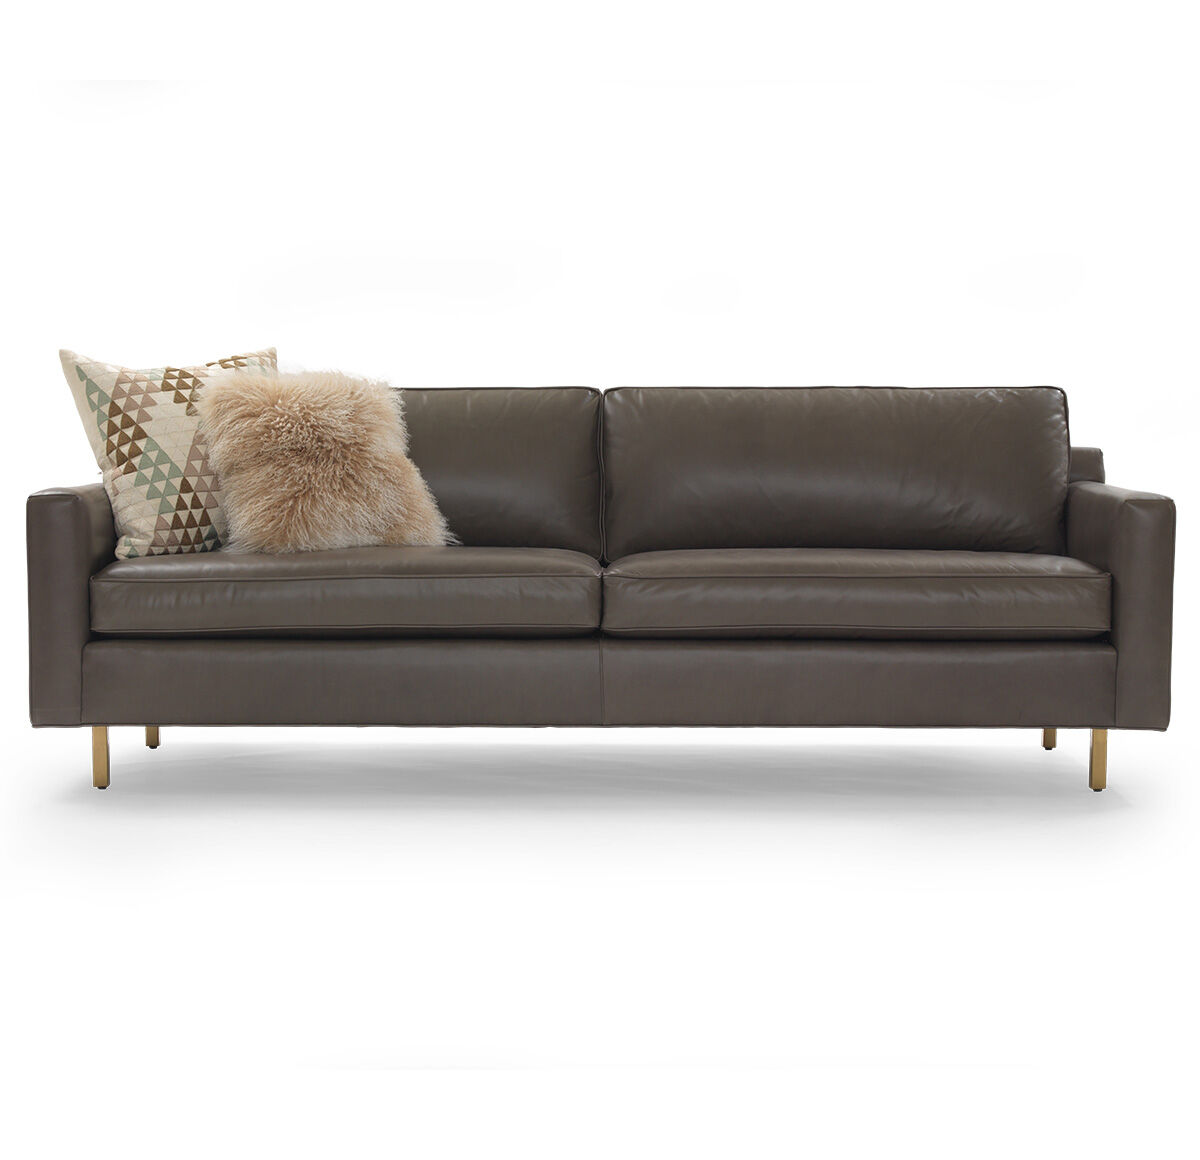 gold leather sofa set spread finelymade furniture